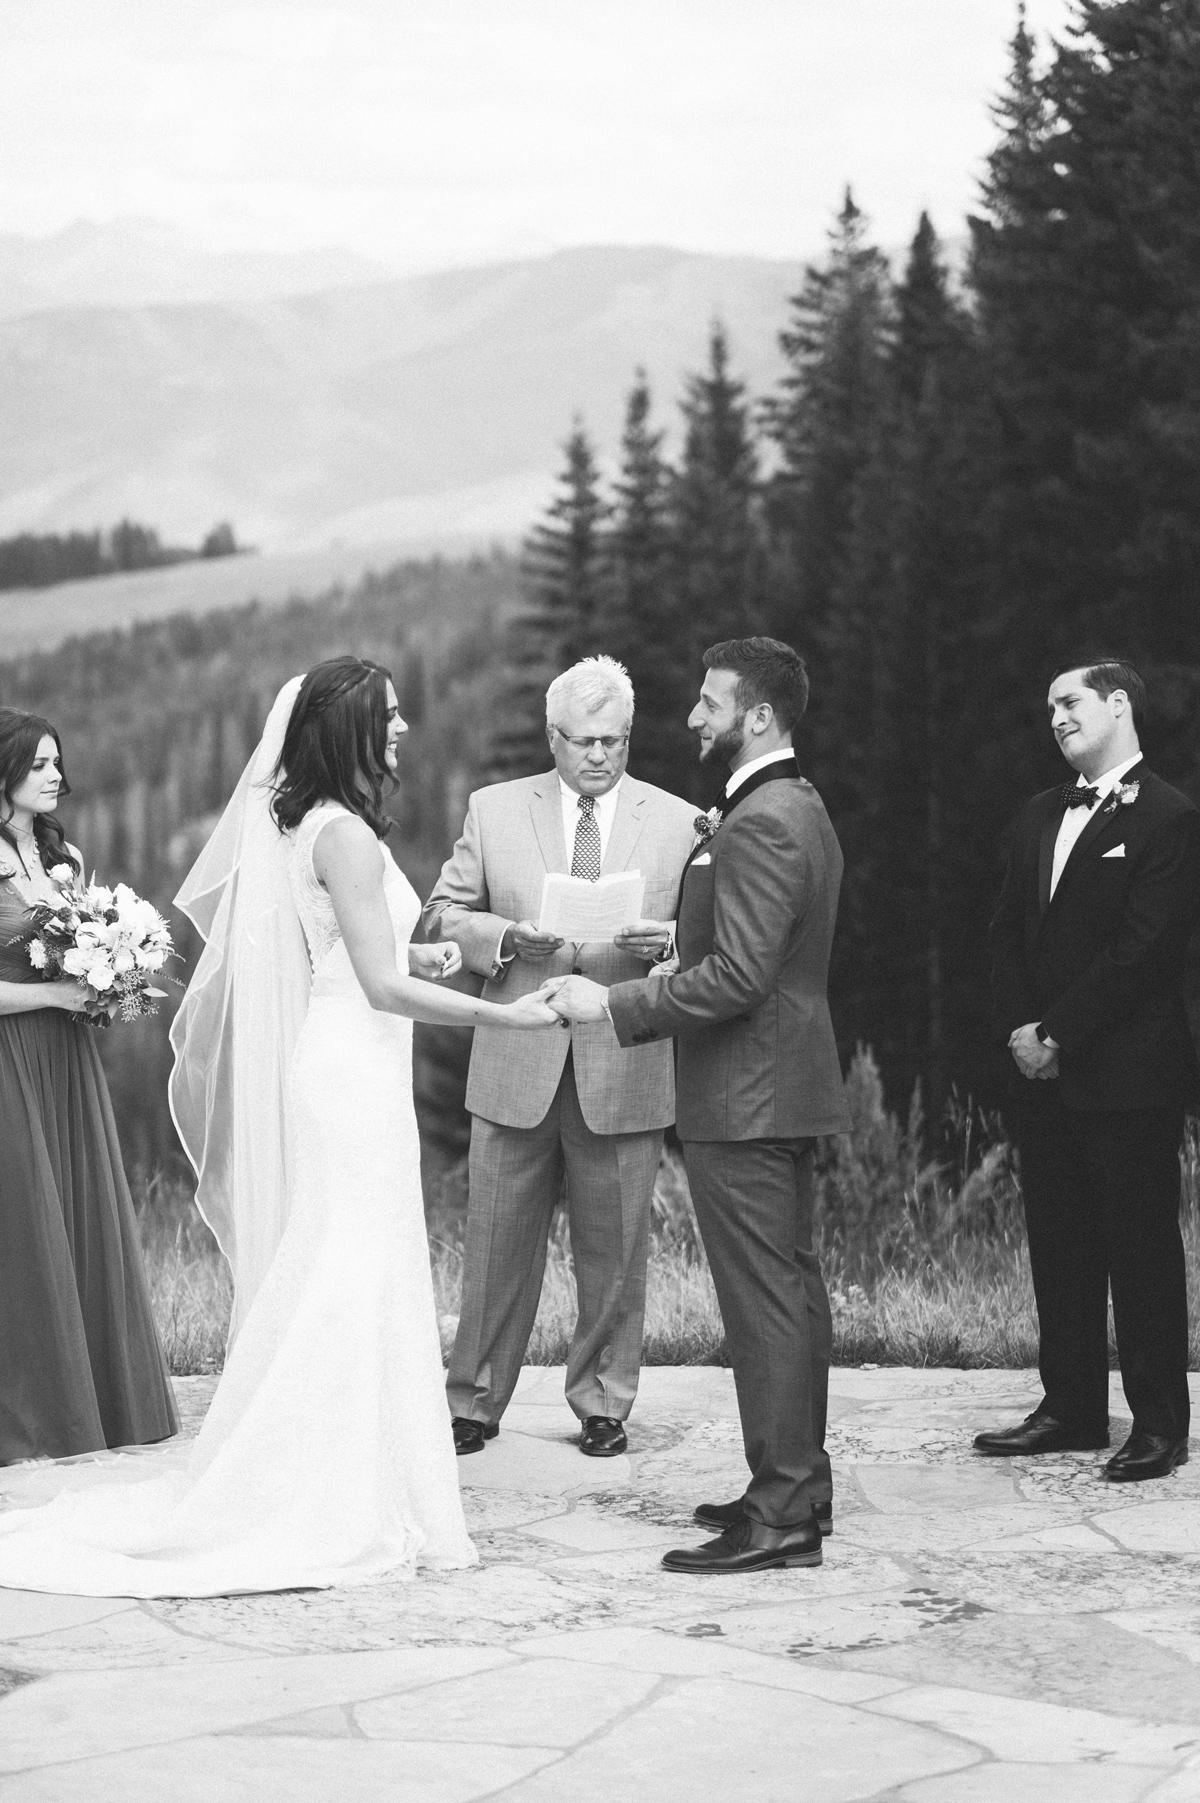 307-beaver-creek--mountain-top-wedding--vows--emotional--black-and-white.jpg